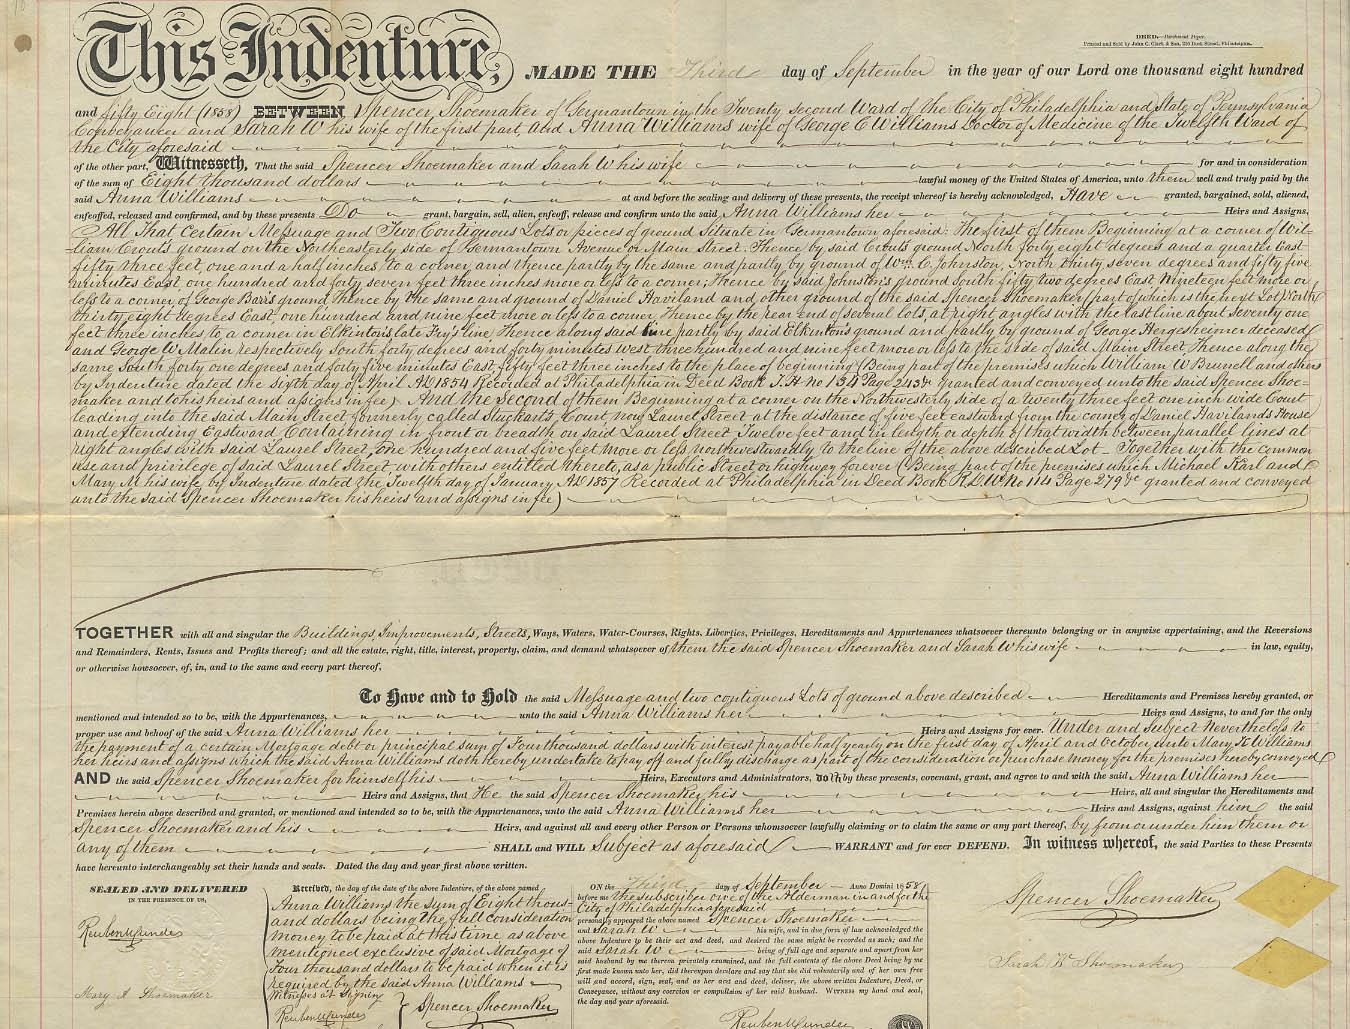 1858 Deed Spencer Shoemaker & wife to Anna Williams Philadelphia